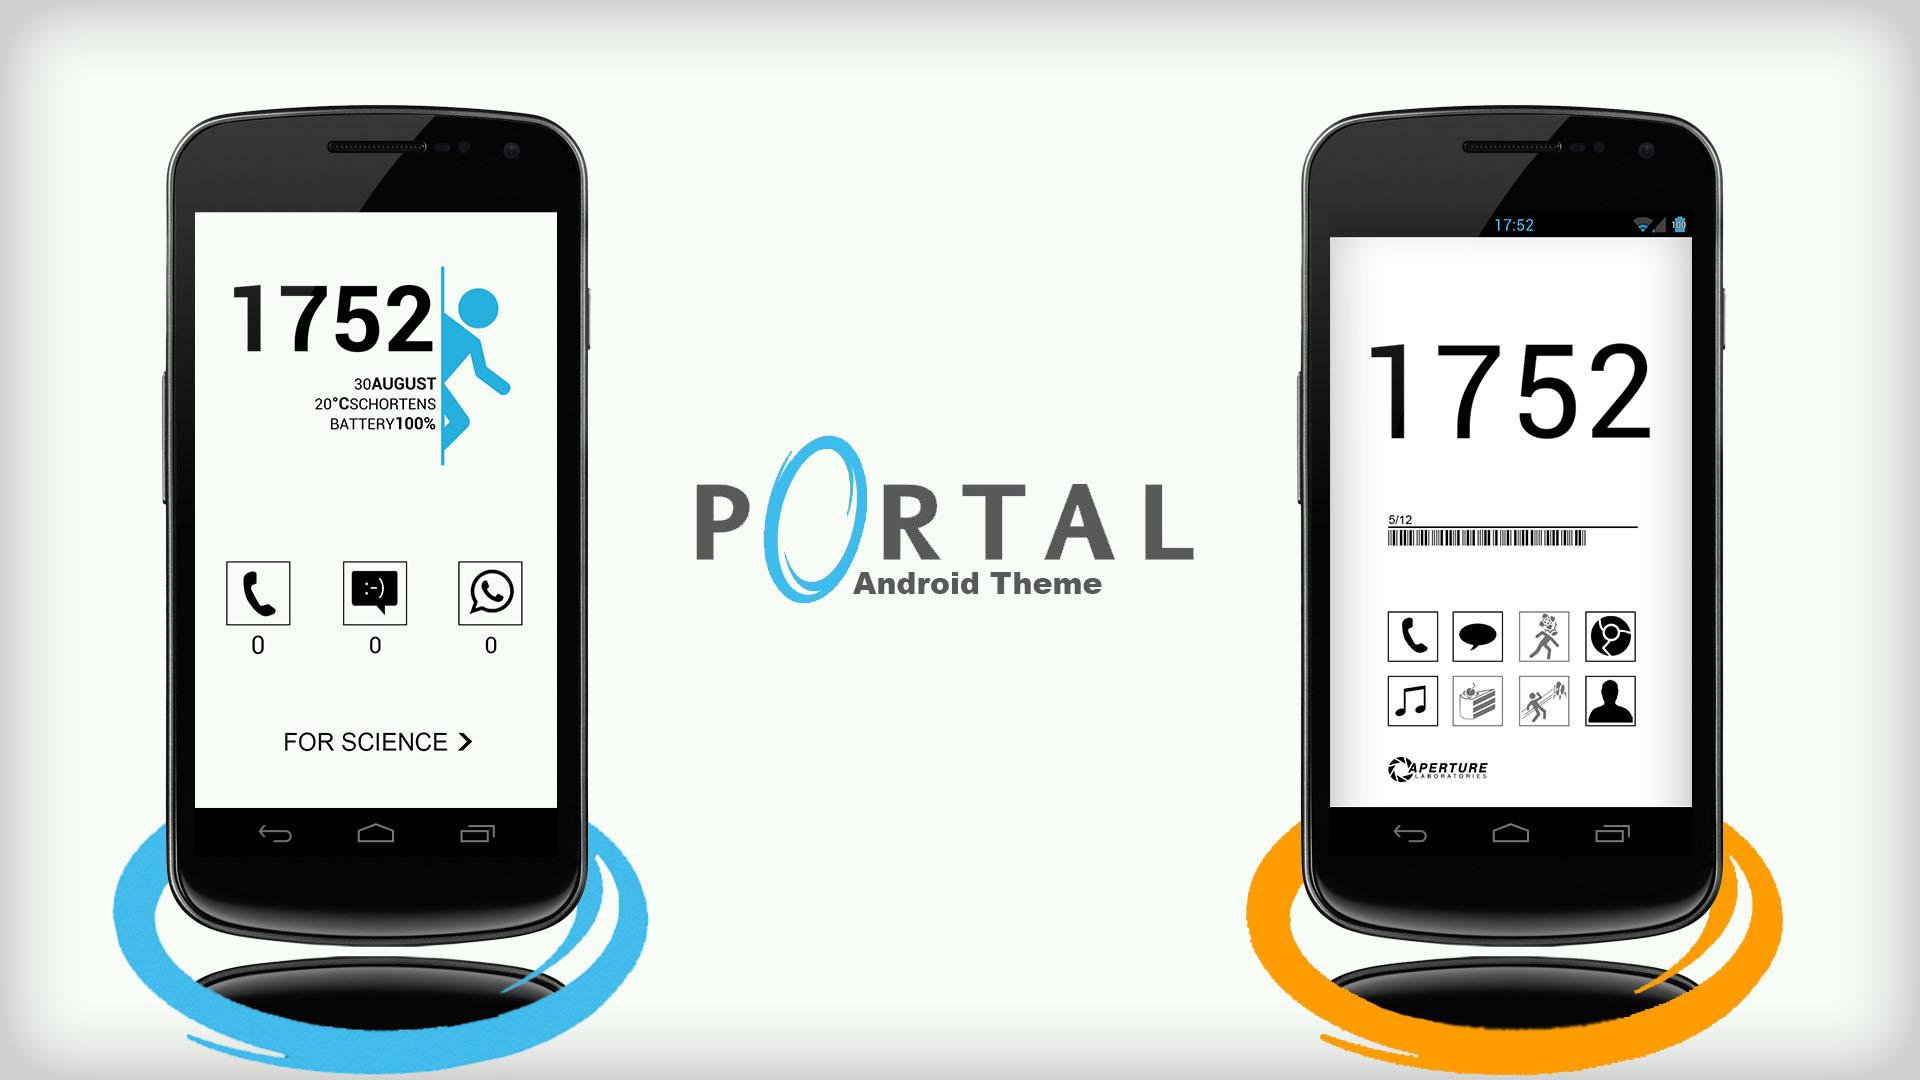 Androidportal portal android theme55runner on deviantart